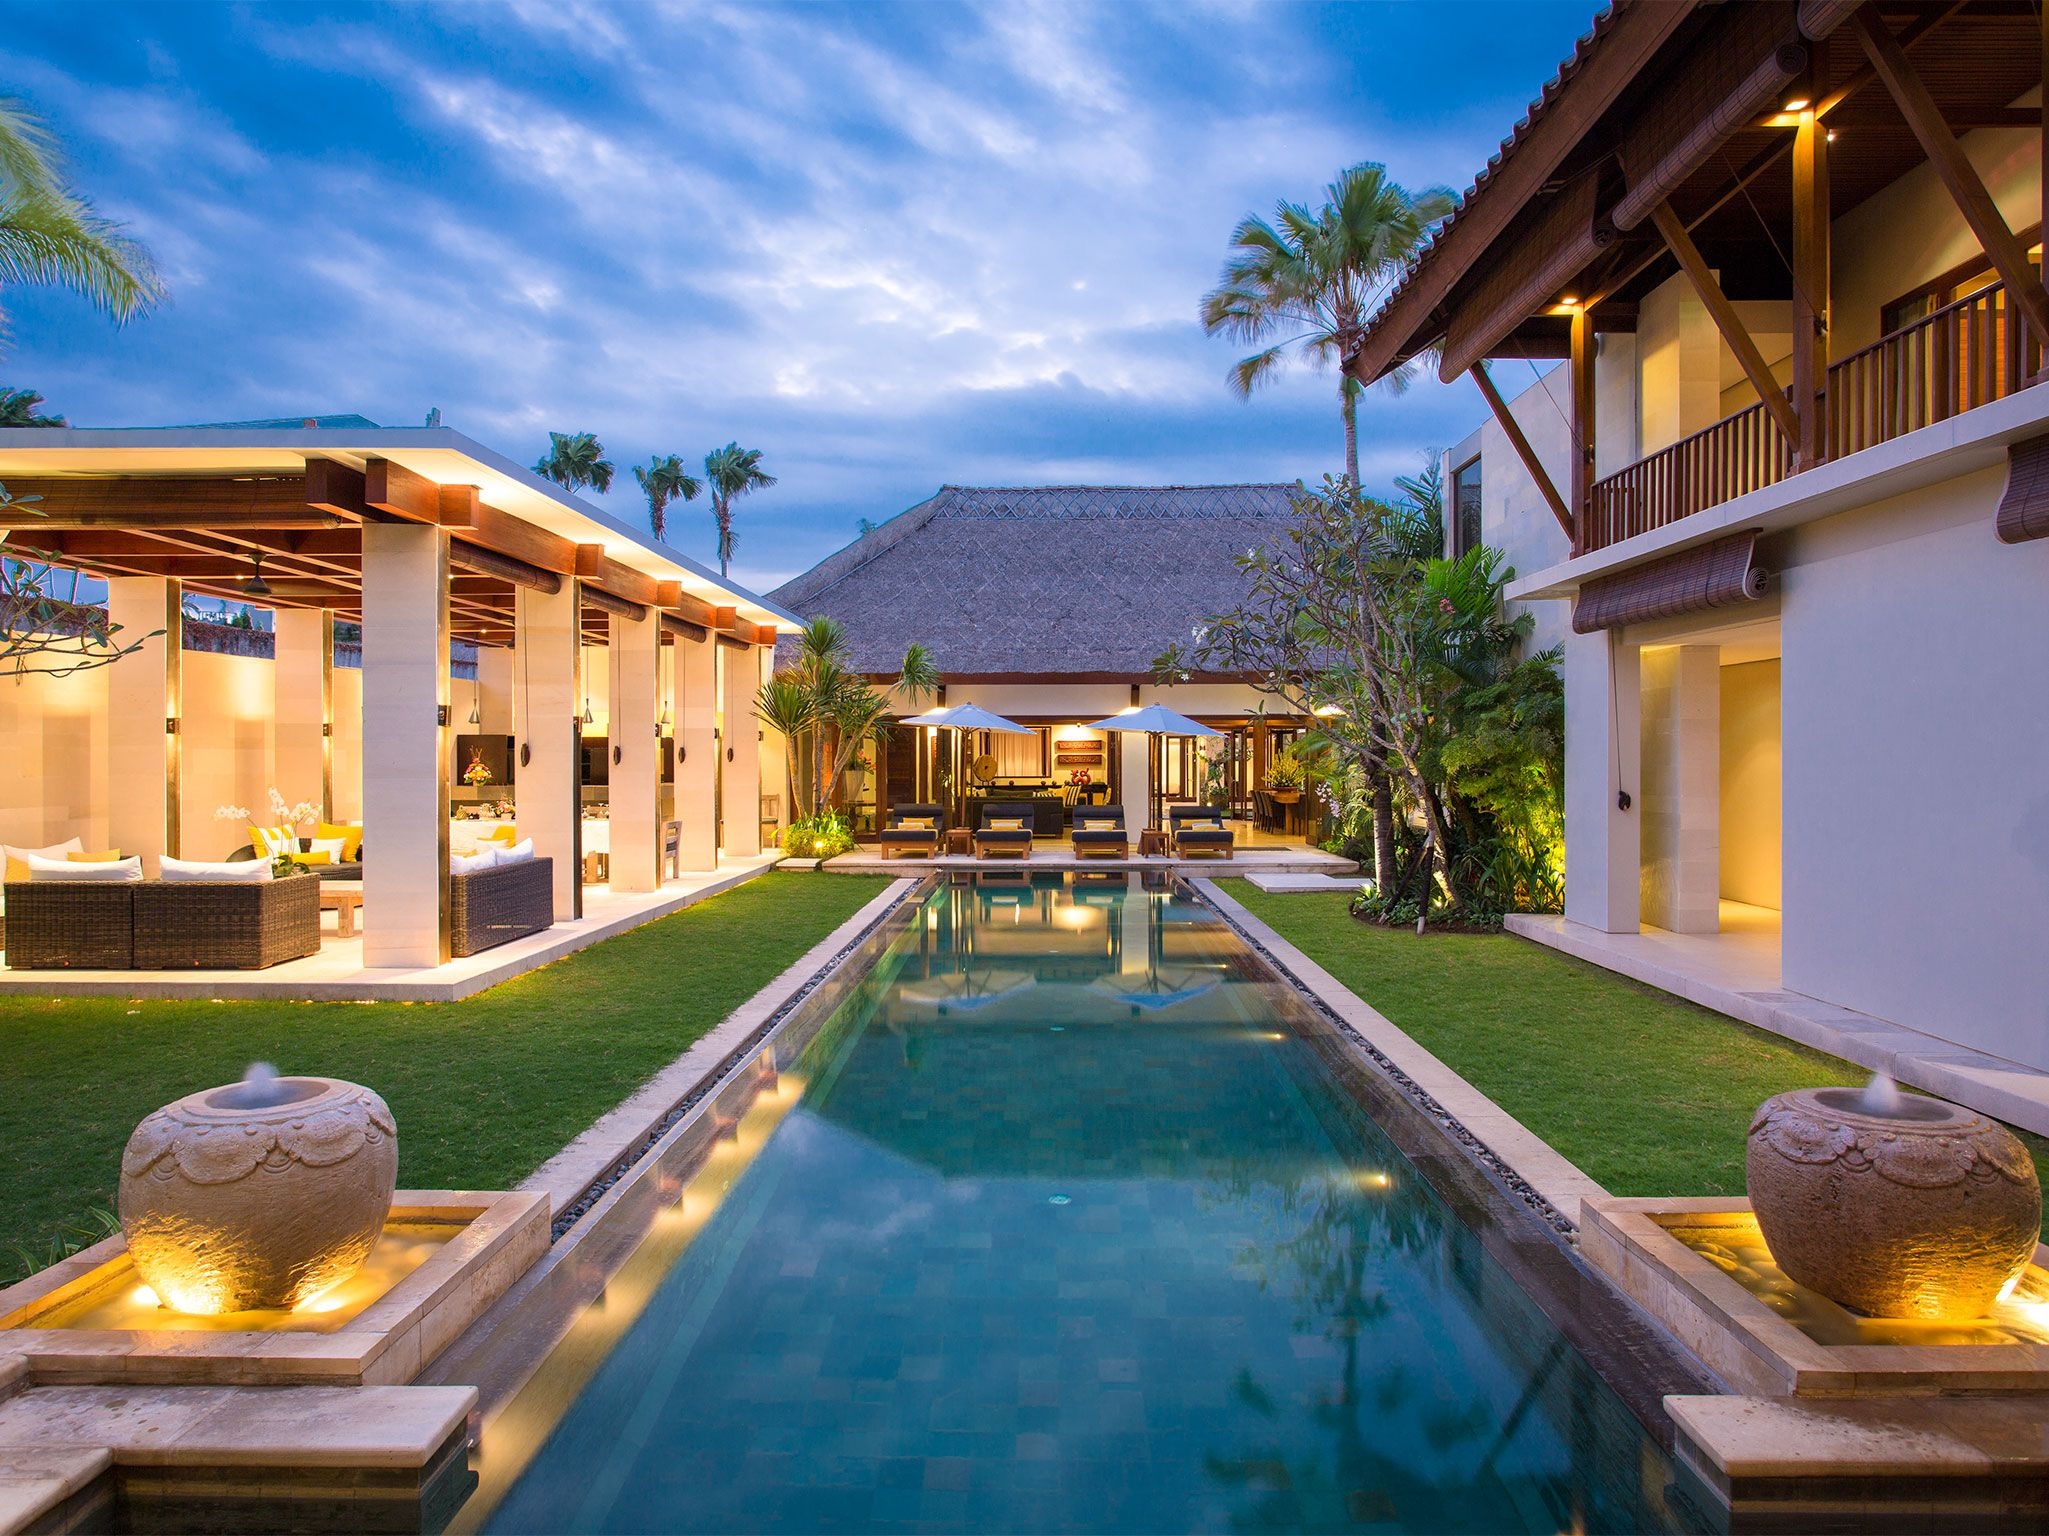 yout holiday vacation rentals - HD1200×900